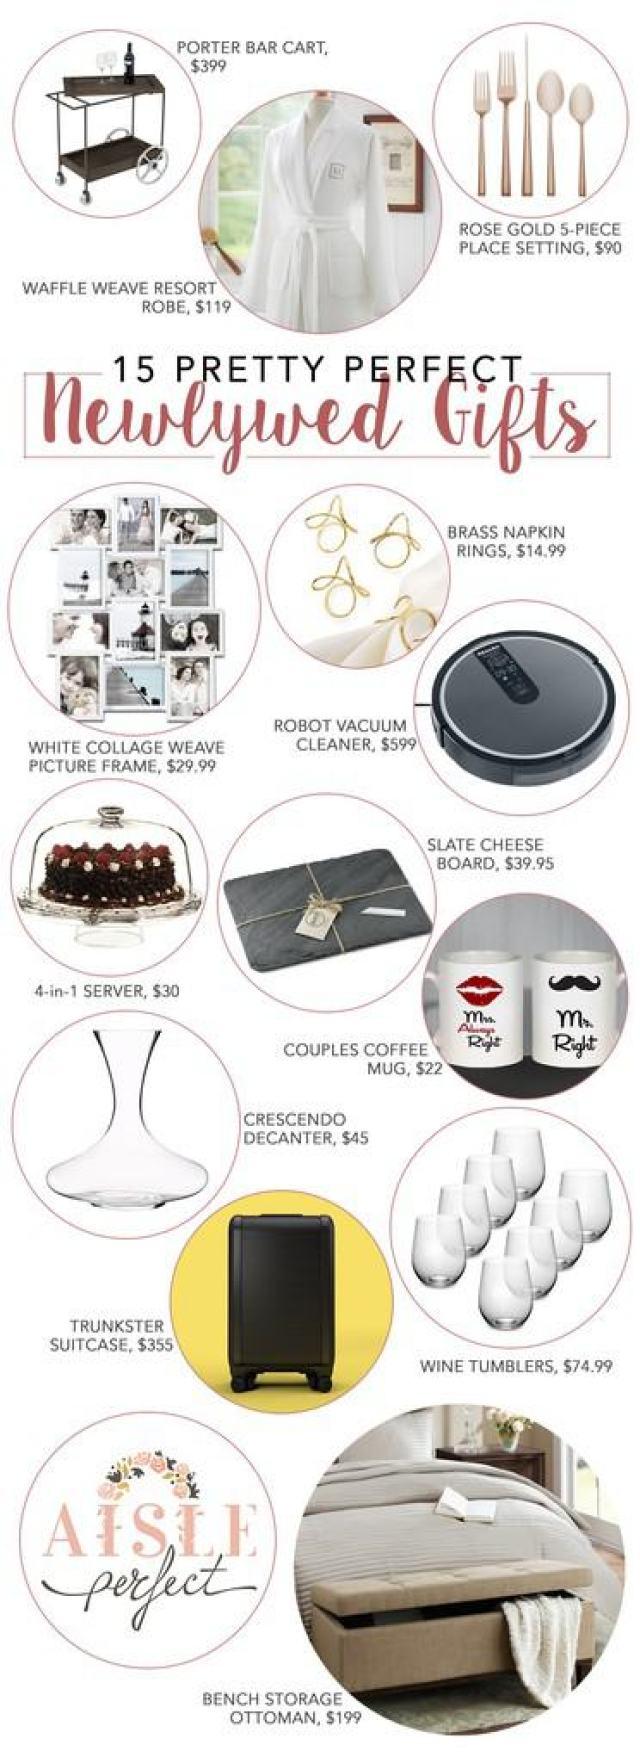 15-Pretty-Perfect-Newlywed-Gifts